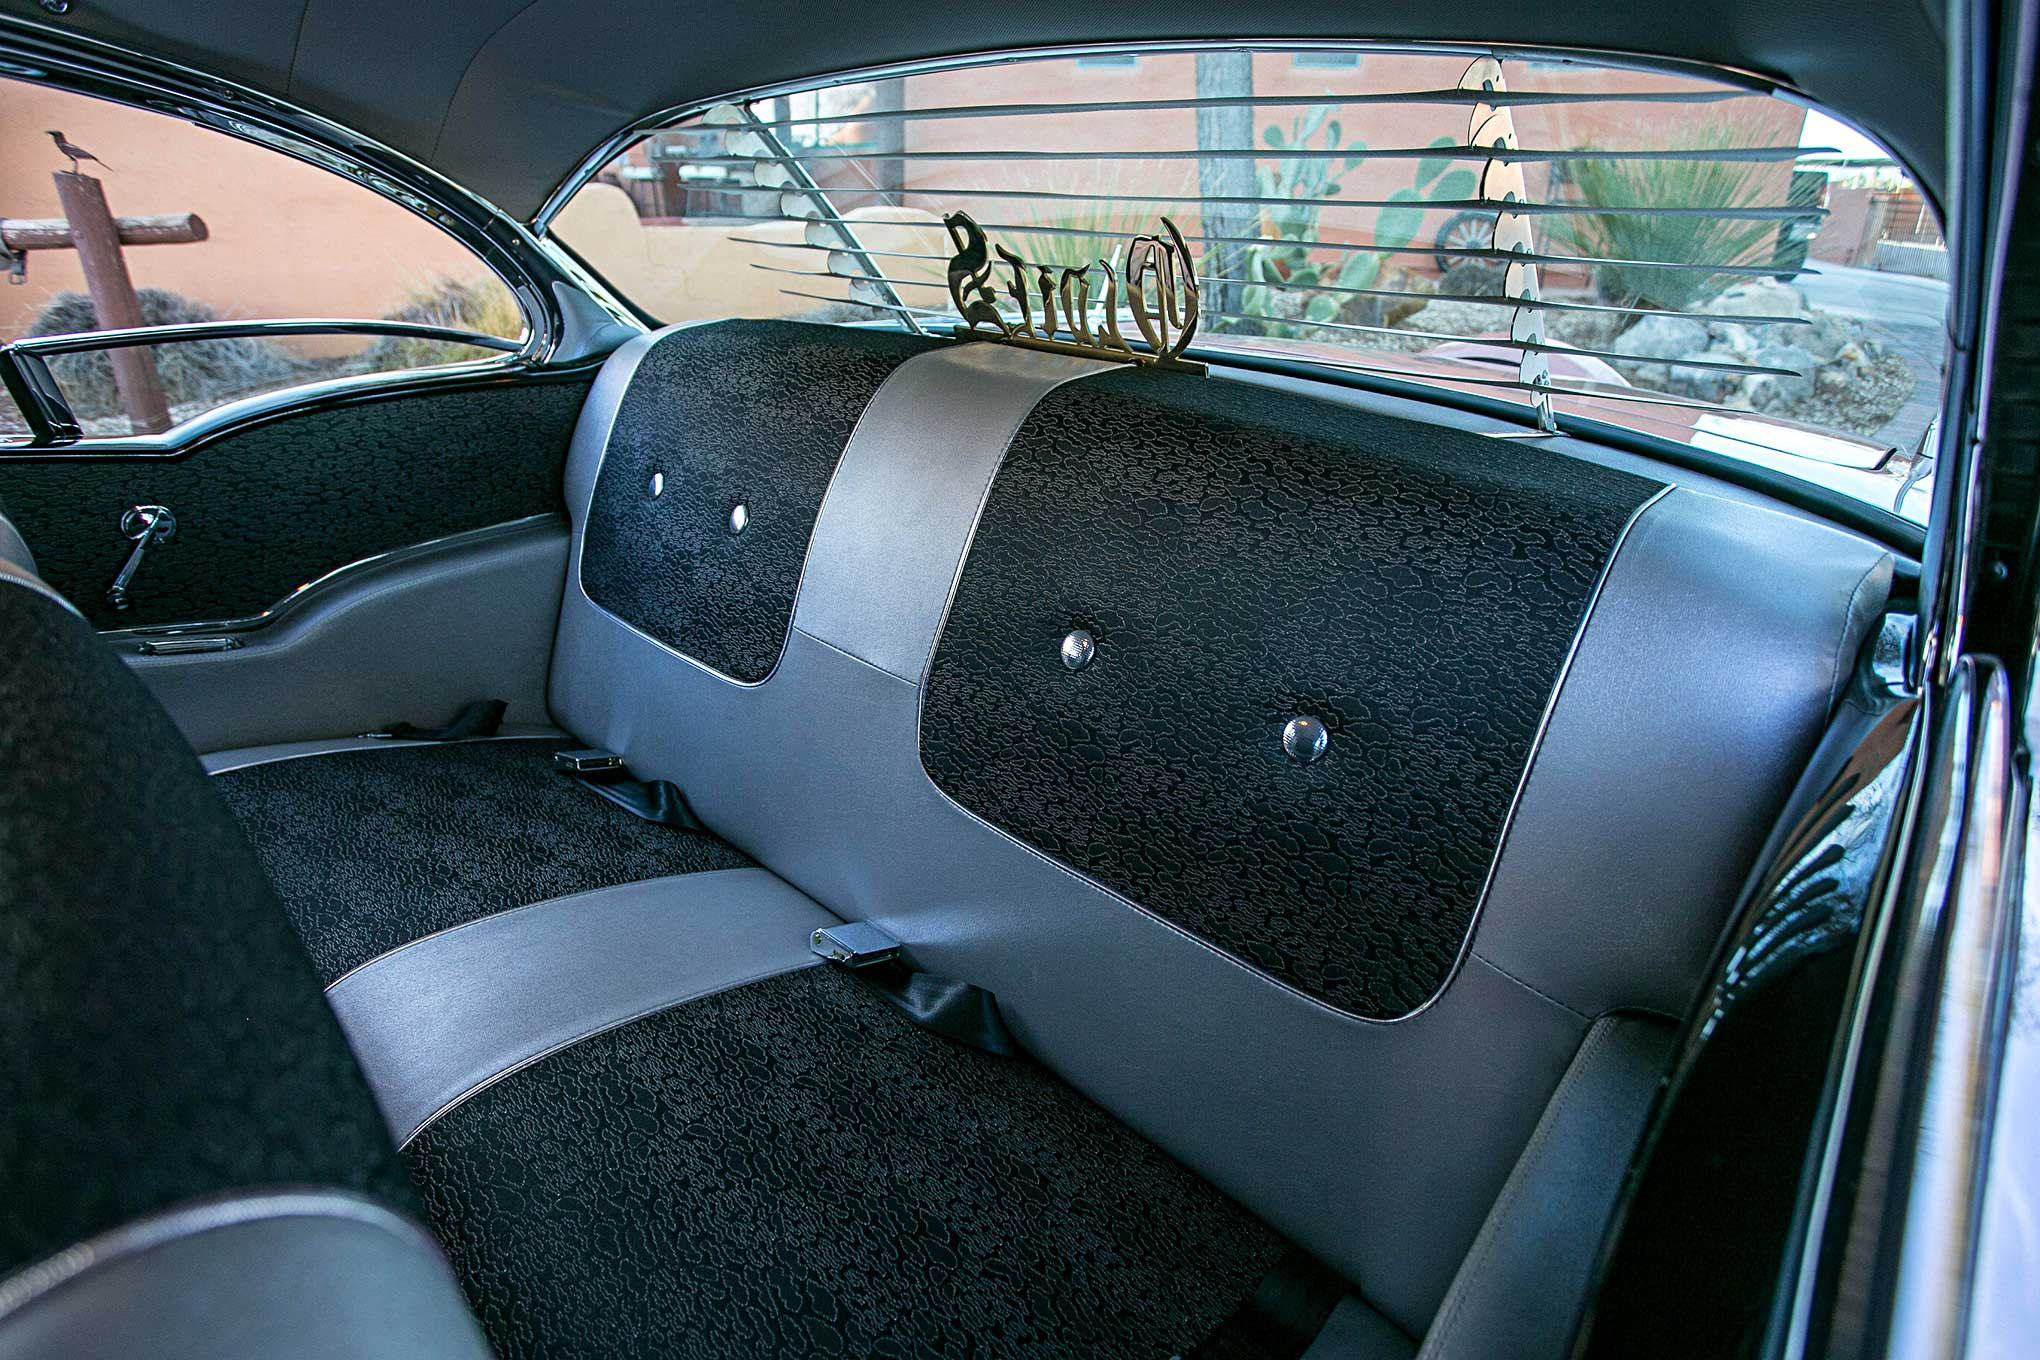 1957 Chevrolet Bel Air Back Seat Lowrider